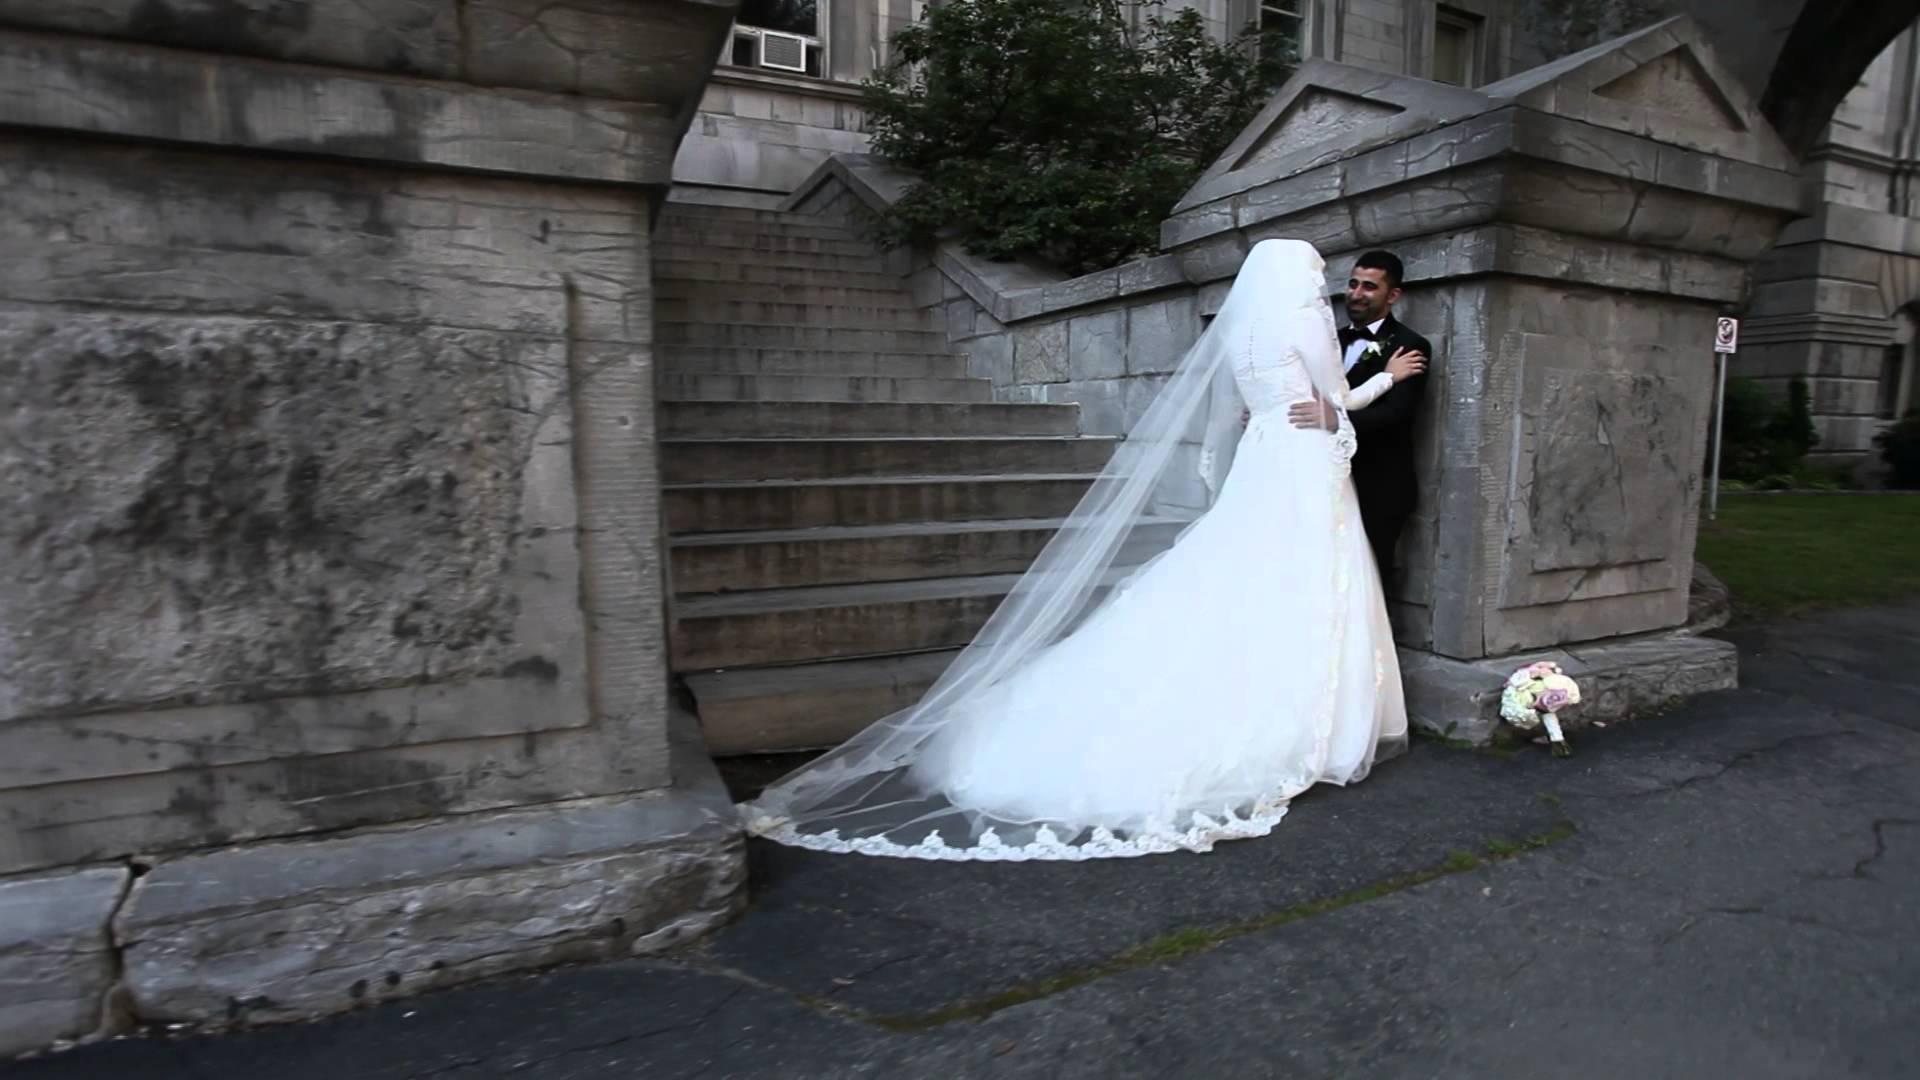 بالصور صور اعراس , رمزيات وخلفيات للاعراس 5474